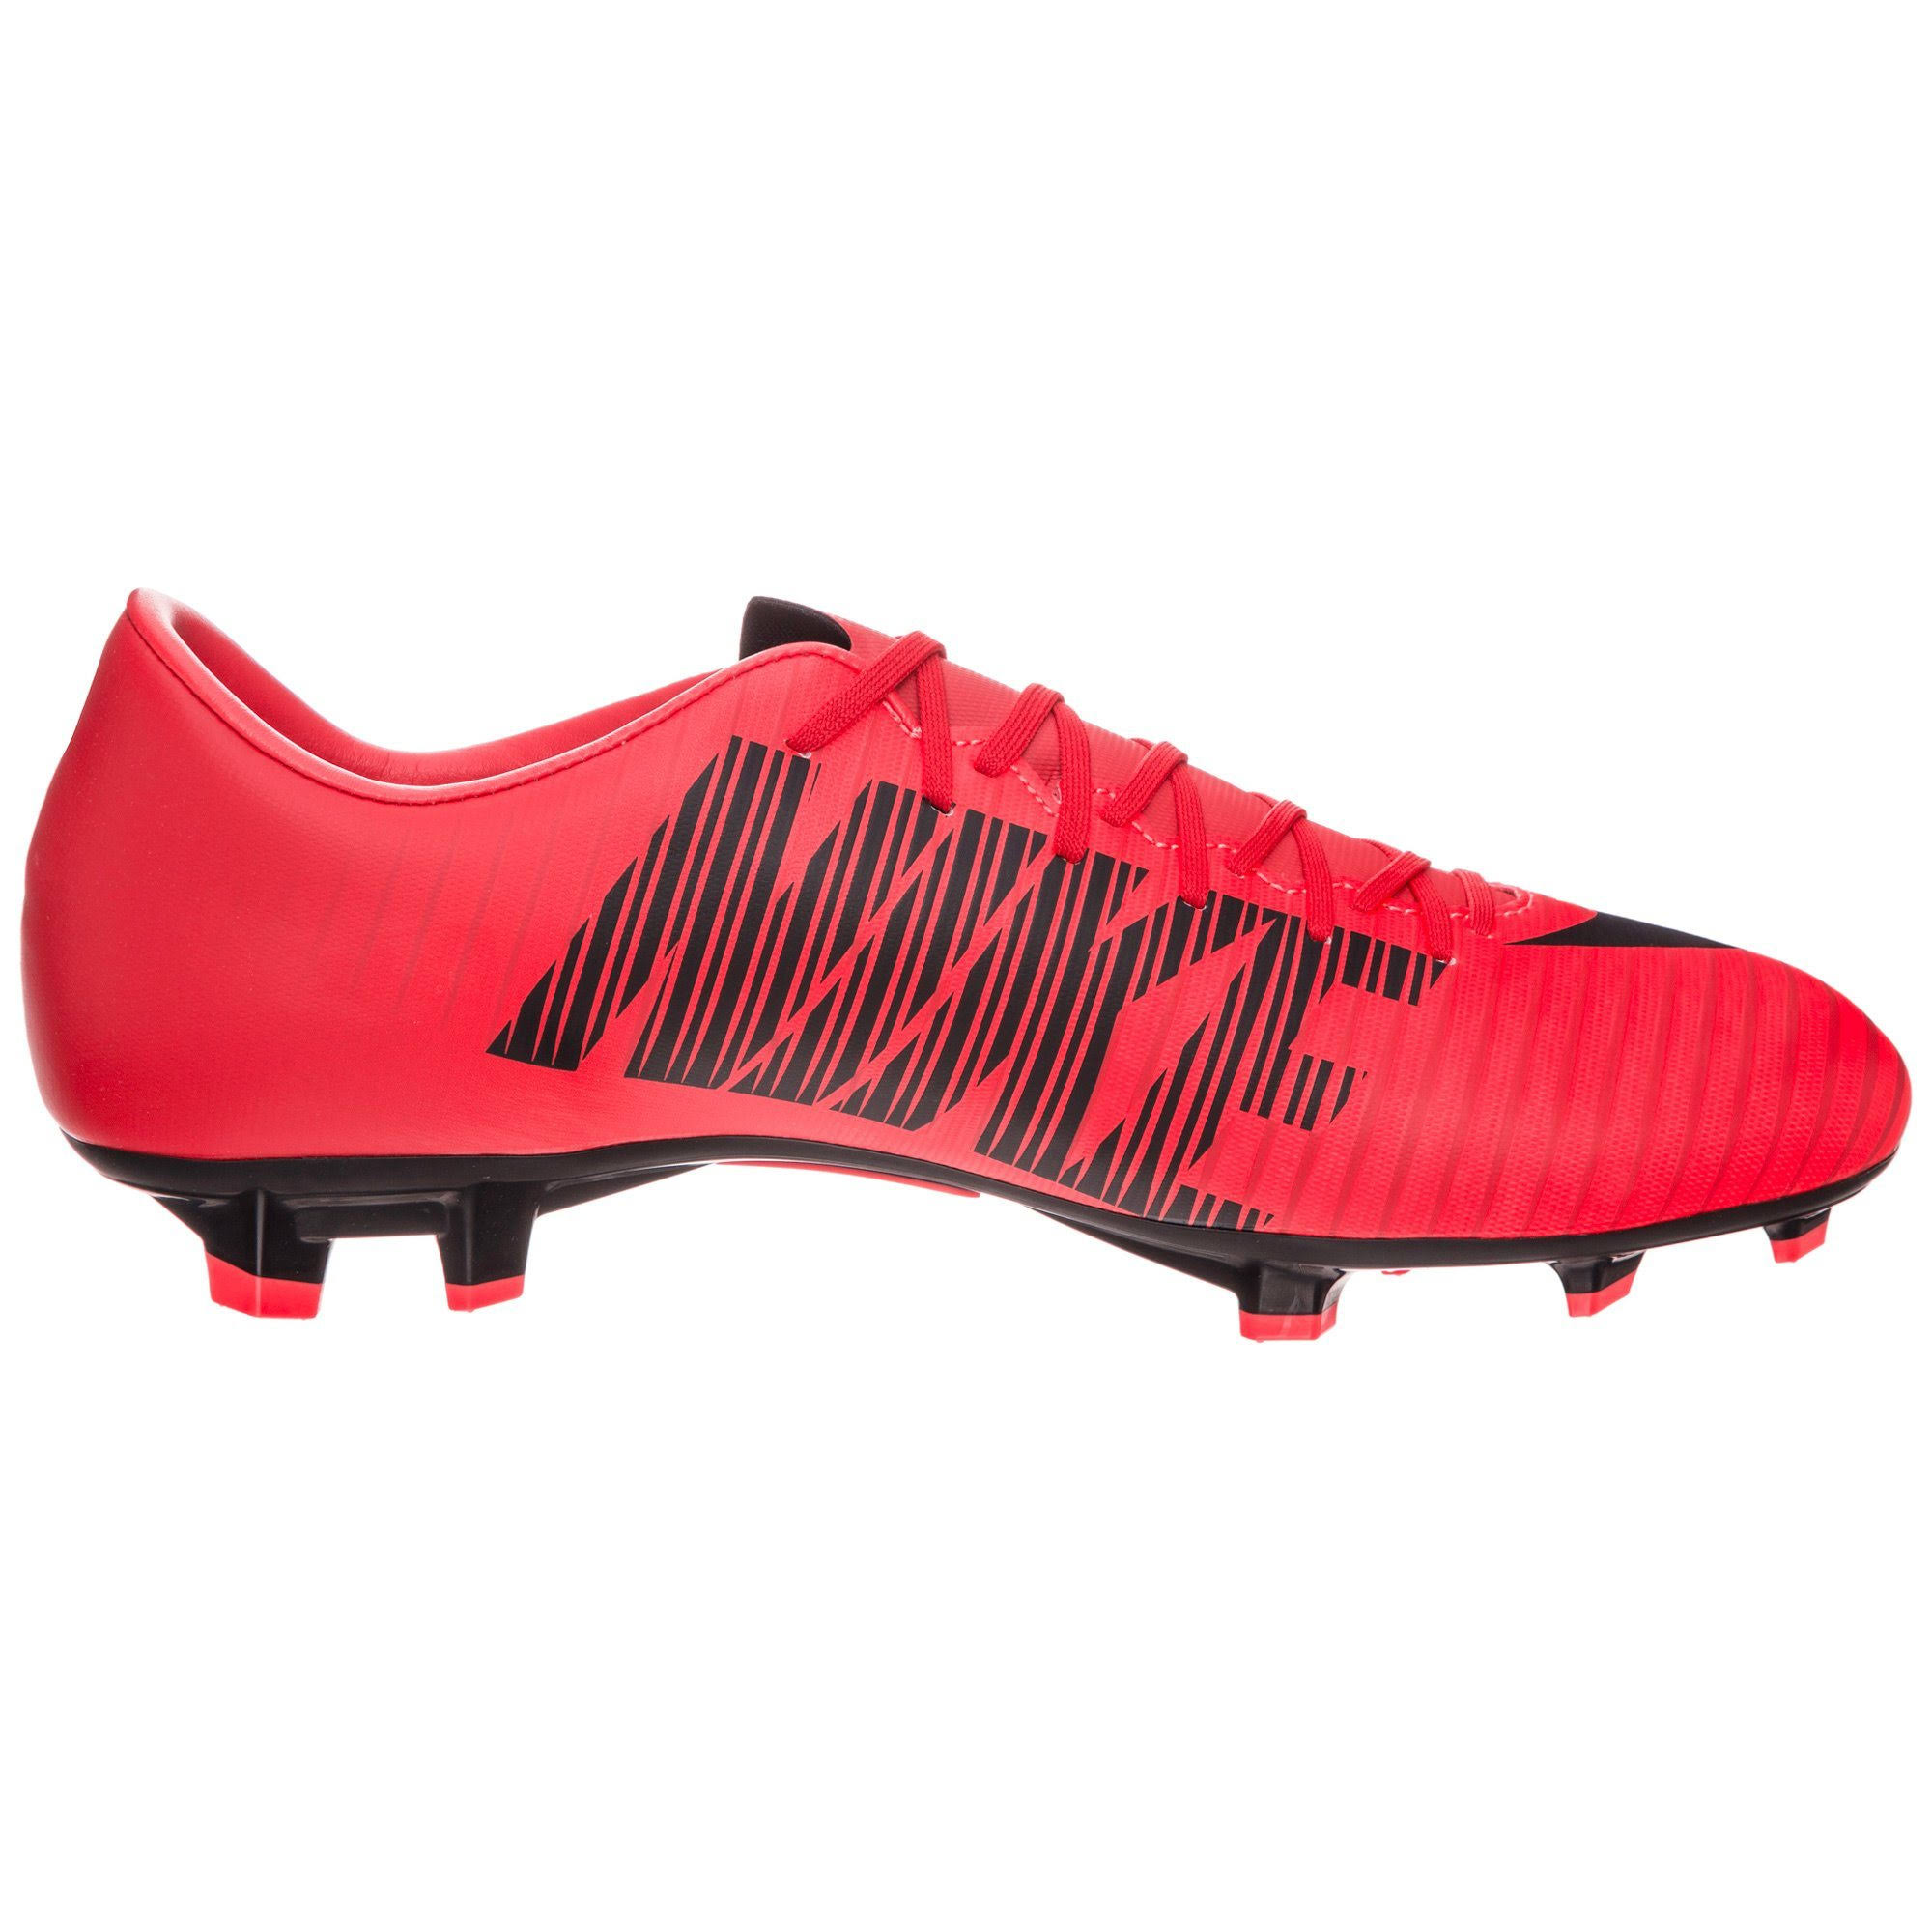 schwarz Vi black Red Crimson bright red Univ Fg Victory Nike Mercurial Fußballschuh University FB0FAU